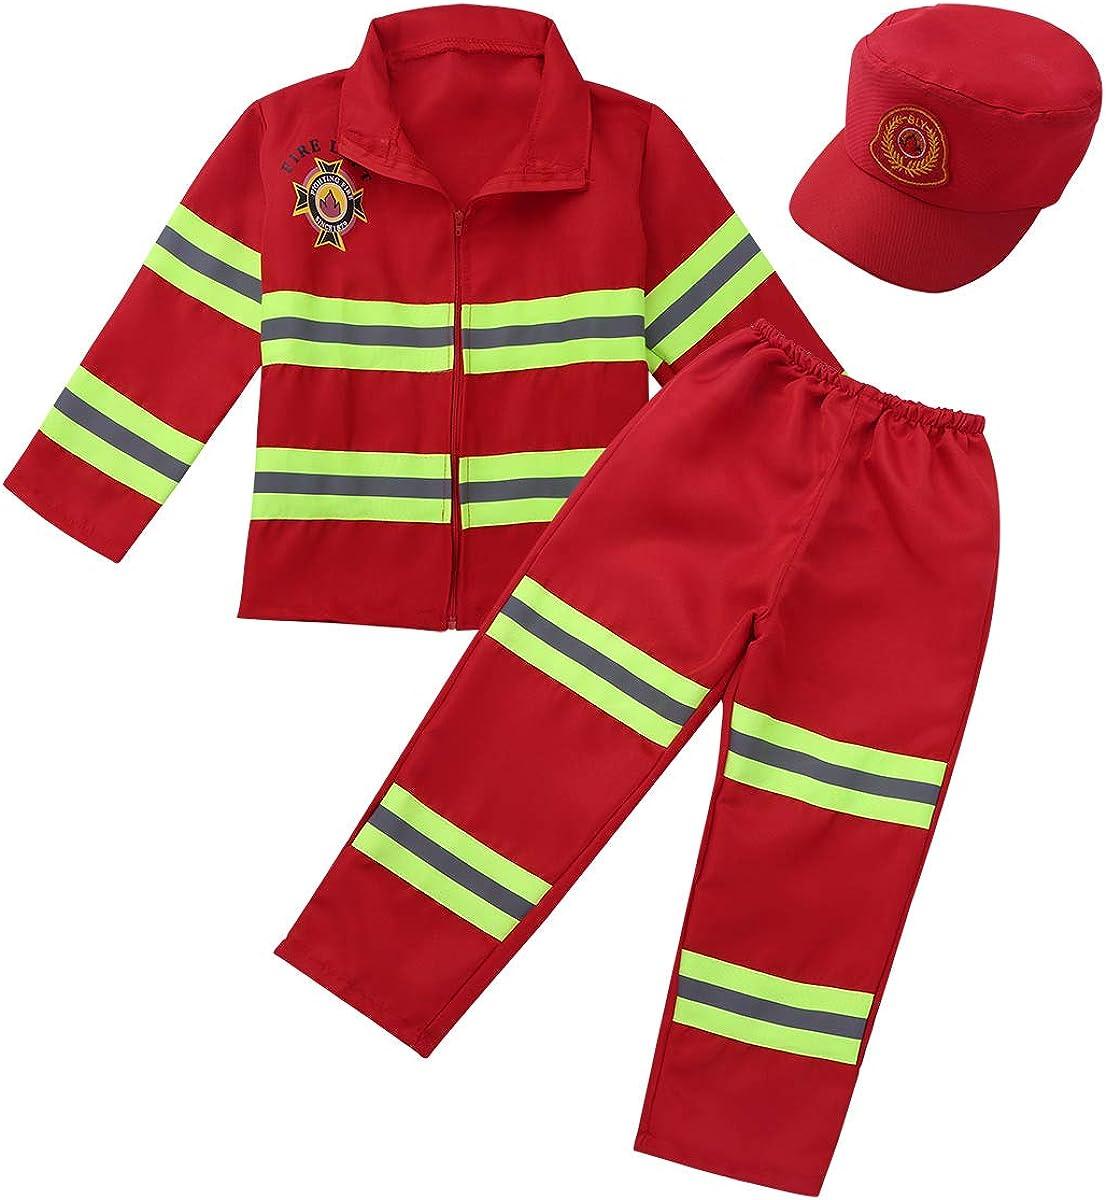 YiZYiF Kids Boys Girls Firefighter Costume Long Sleeve Jacket Pants Role Play Dress up Set